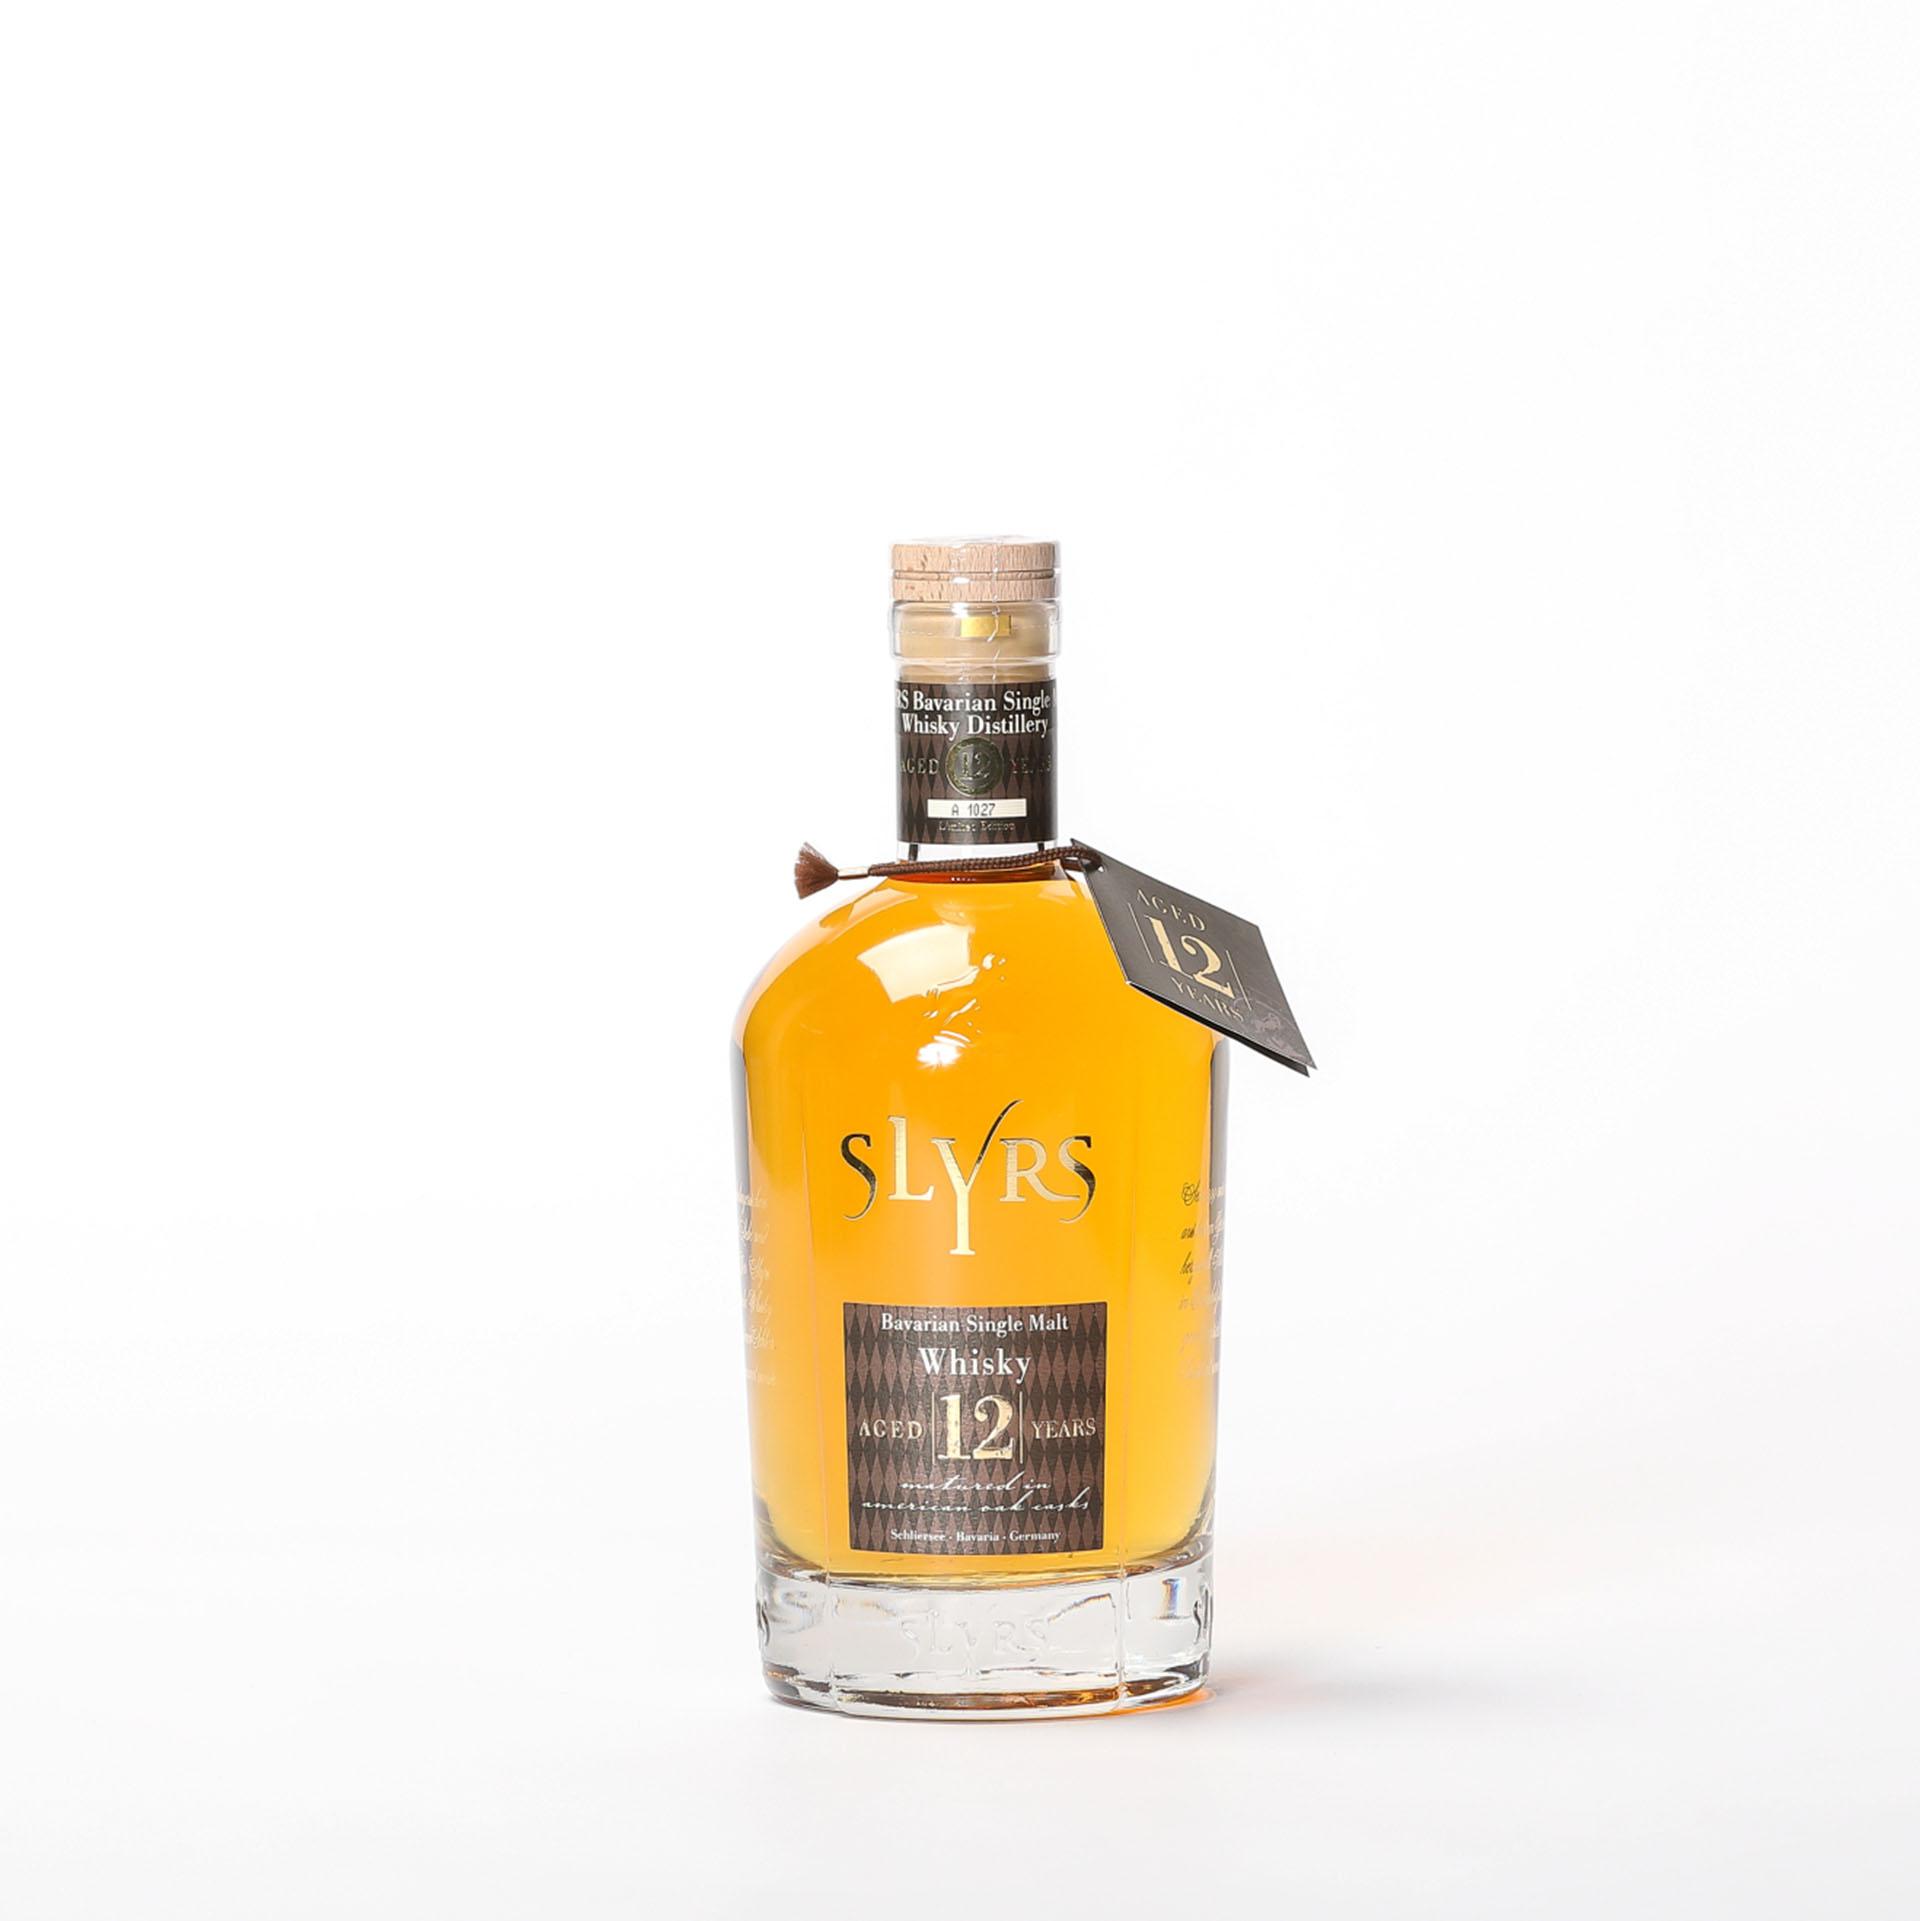 Produktbild Bavarian Single Malt Whisky 12 Years - Slyrs Destillerie| DINZLER Kaffeerösterei